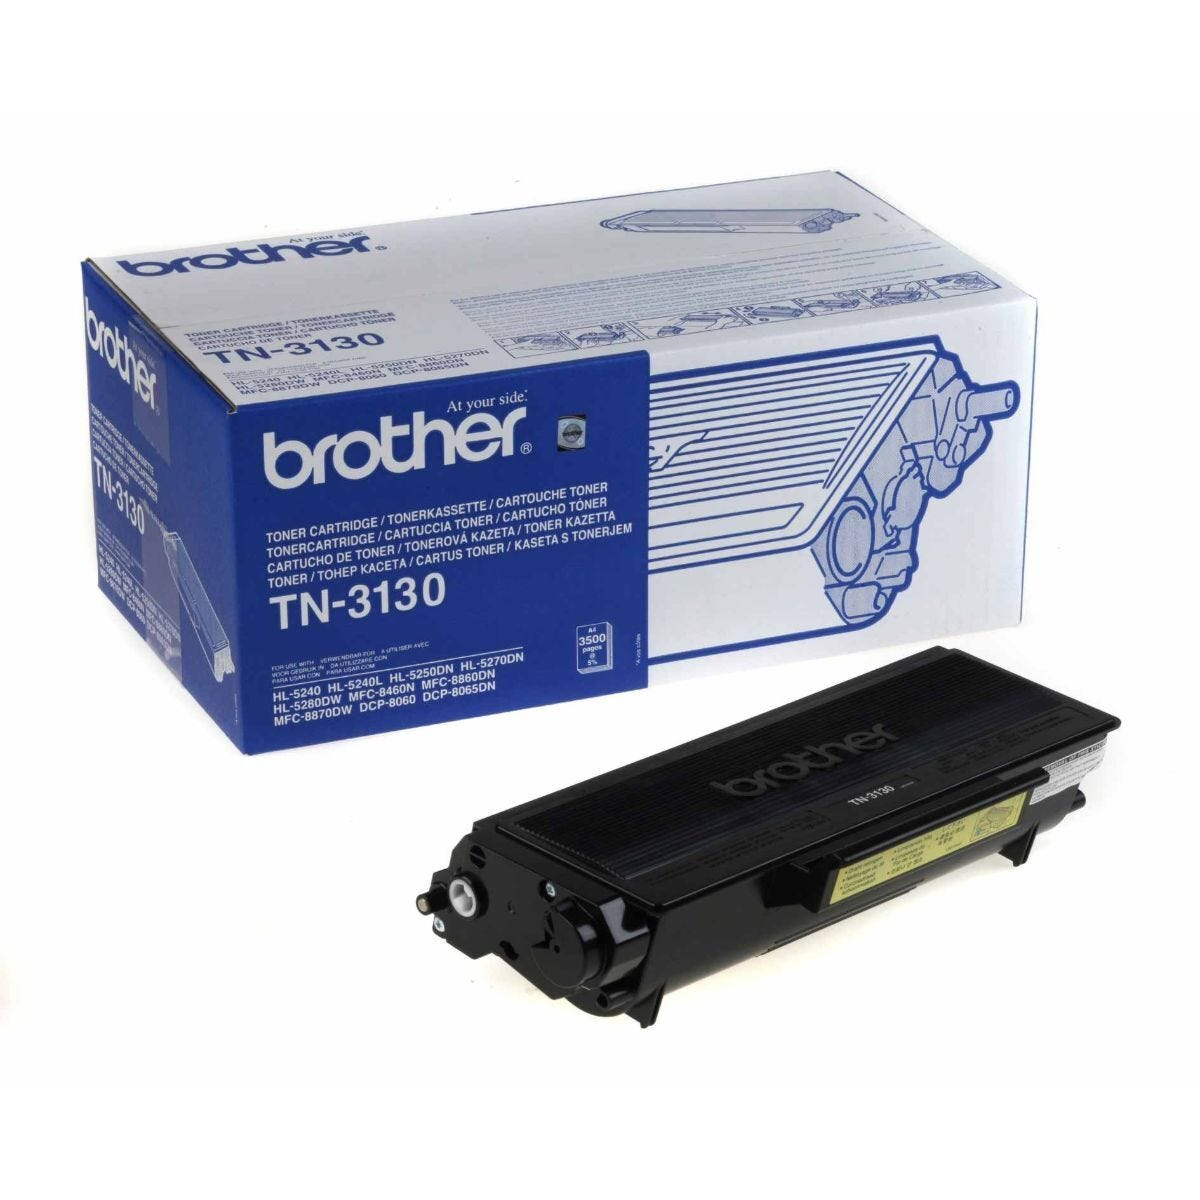 Brother TN3130 Ink Laser Printer Toner Cartridge